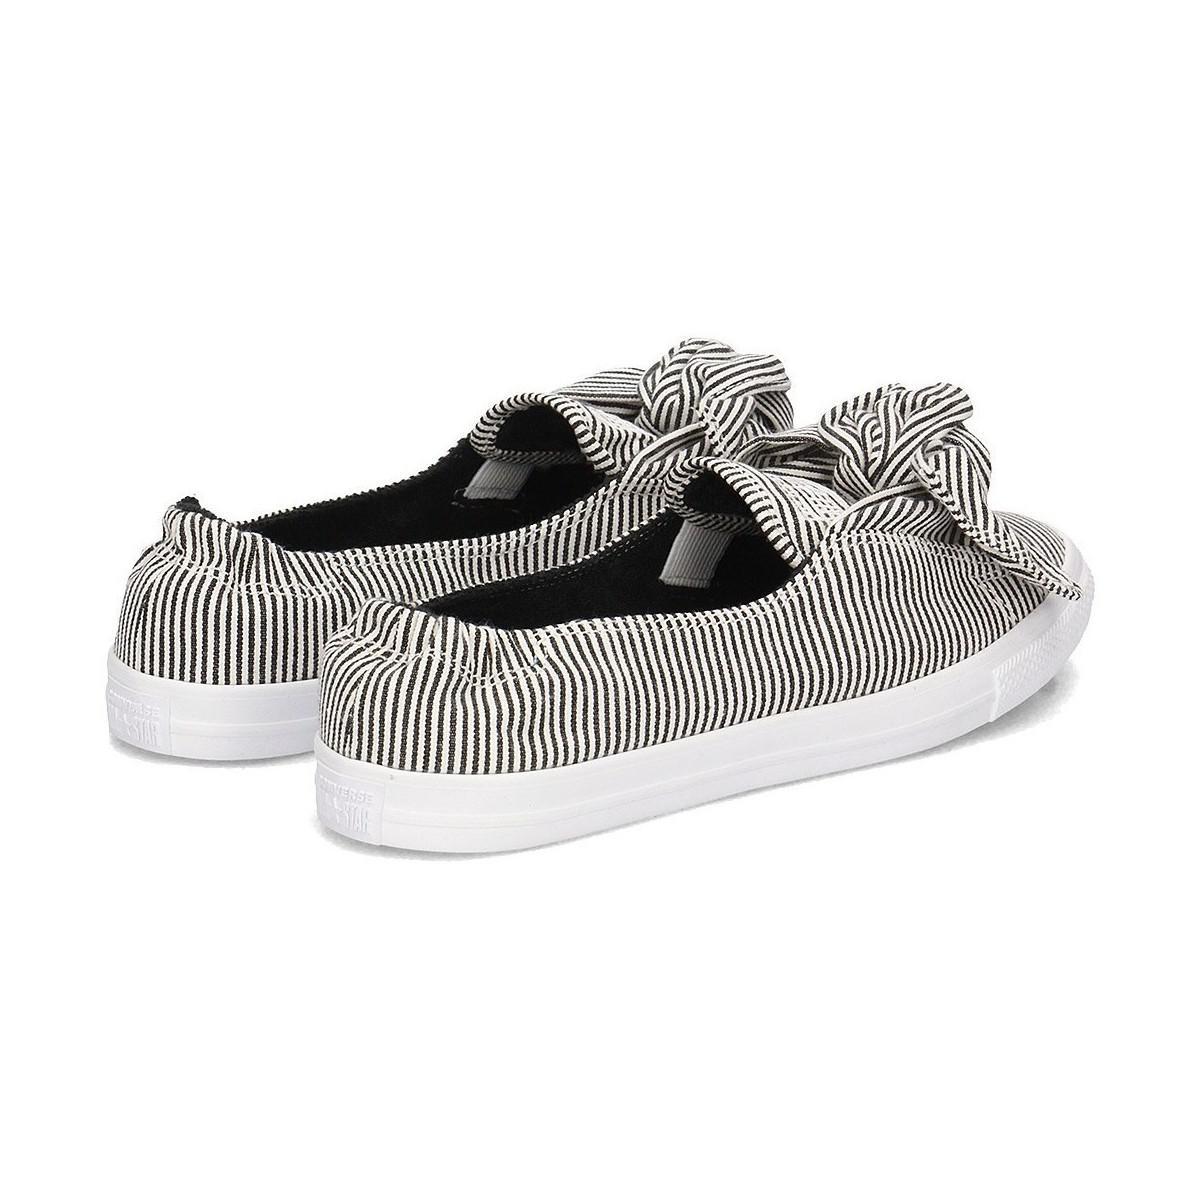 Converse Chuck Taylor All Star Slip Women S Shoes Pumps